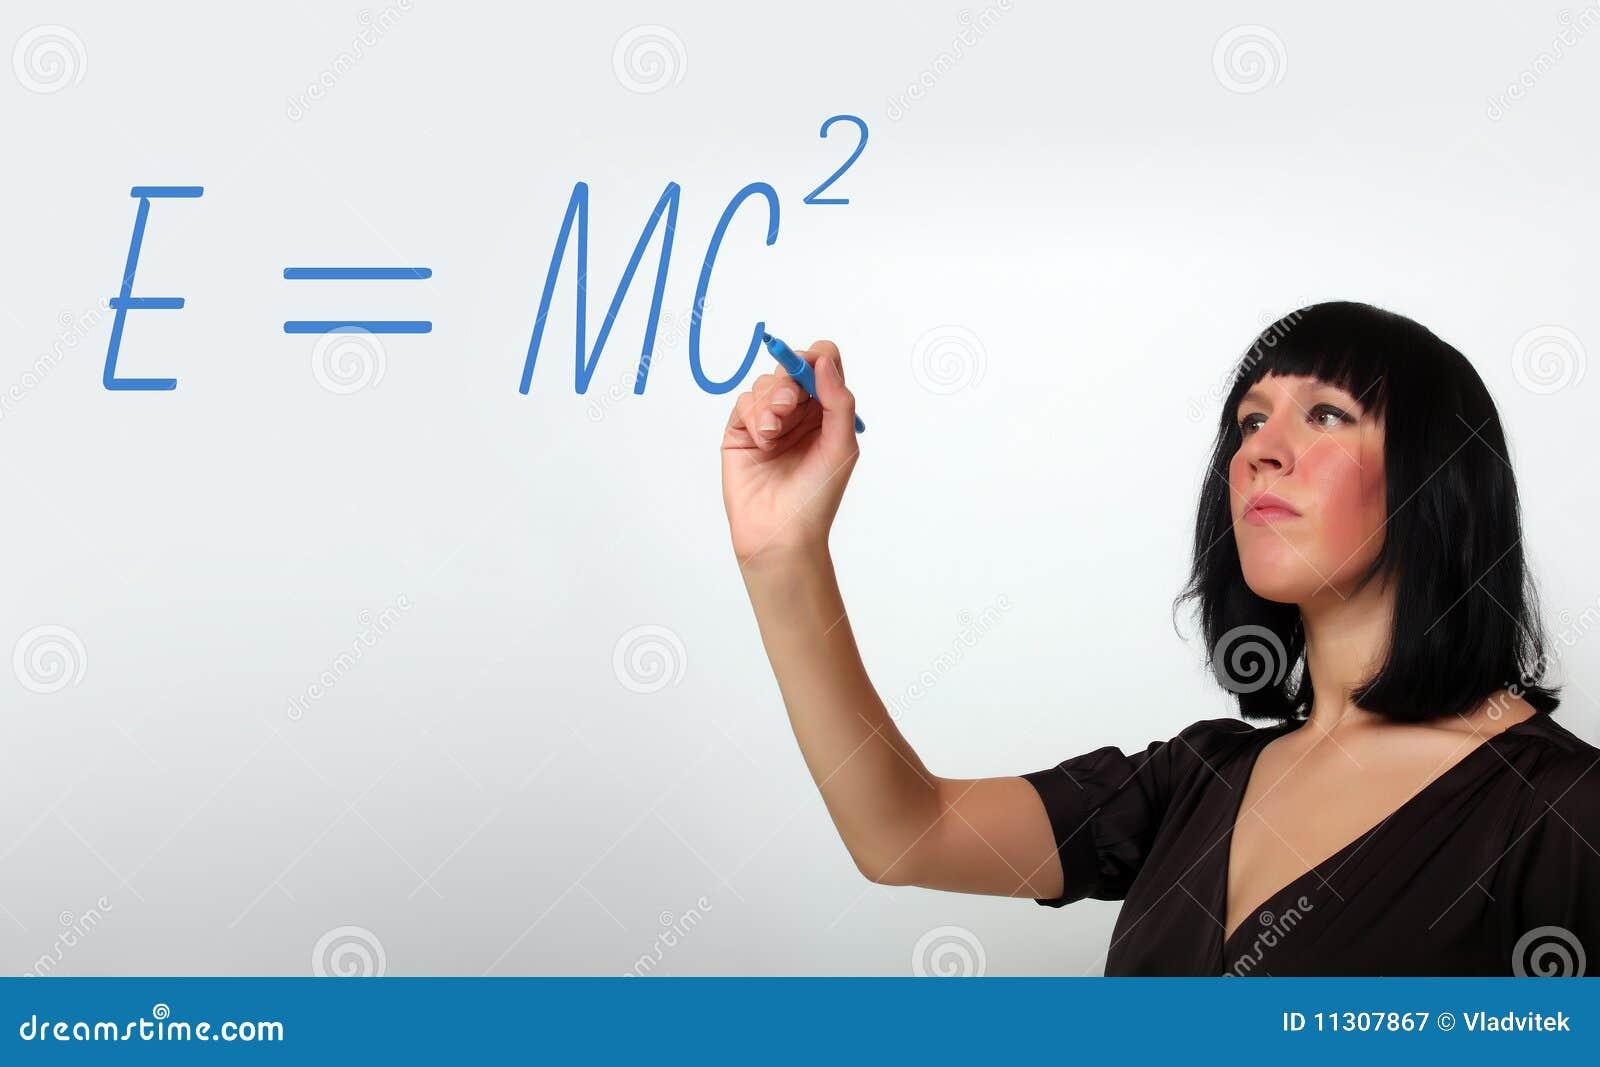 how to become an algebra teacher